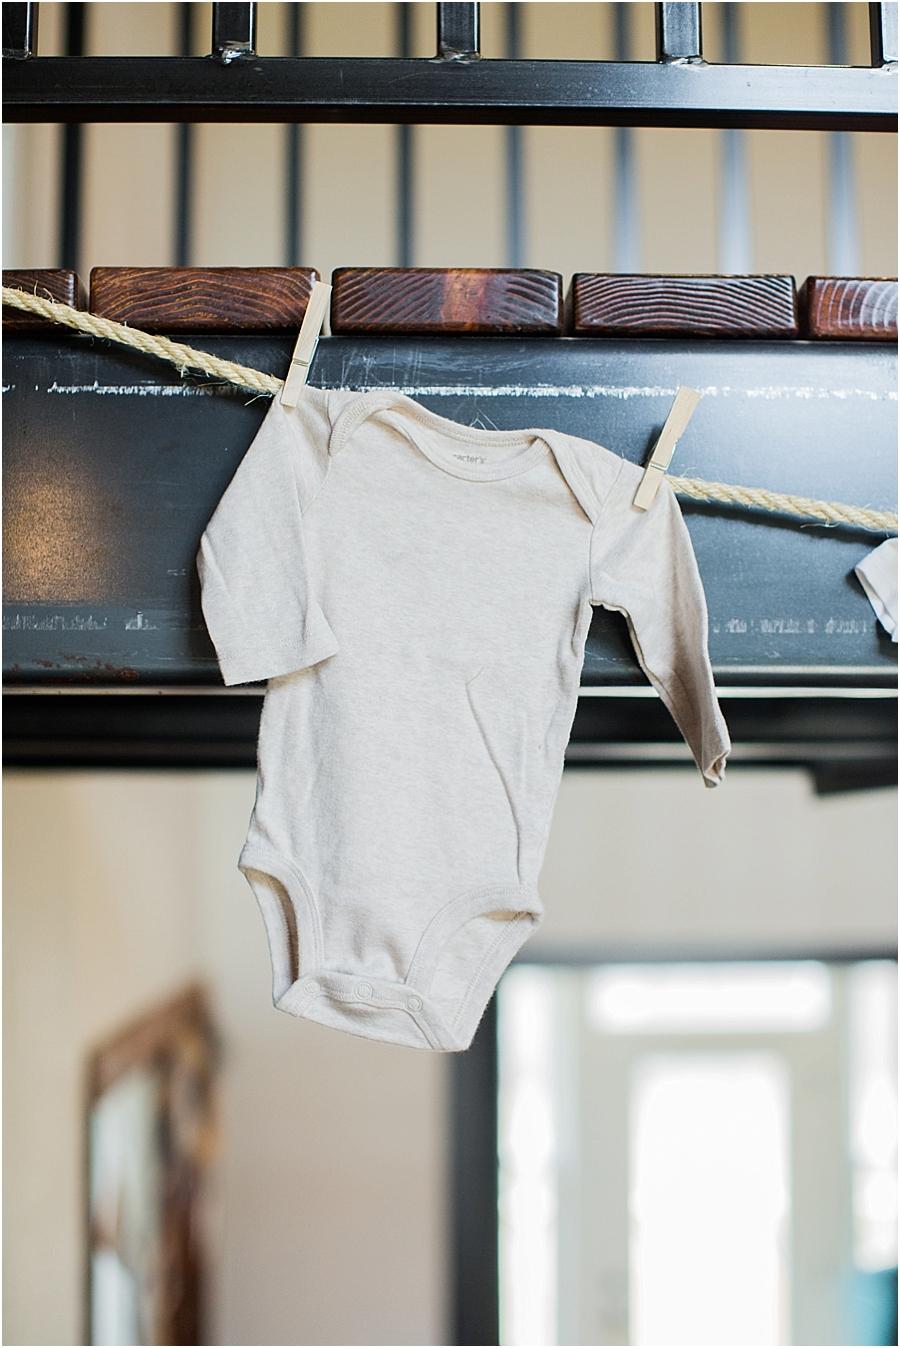 Jordan Brittley's Baby Boy Shower - Jordan Brittley Photography